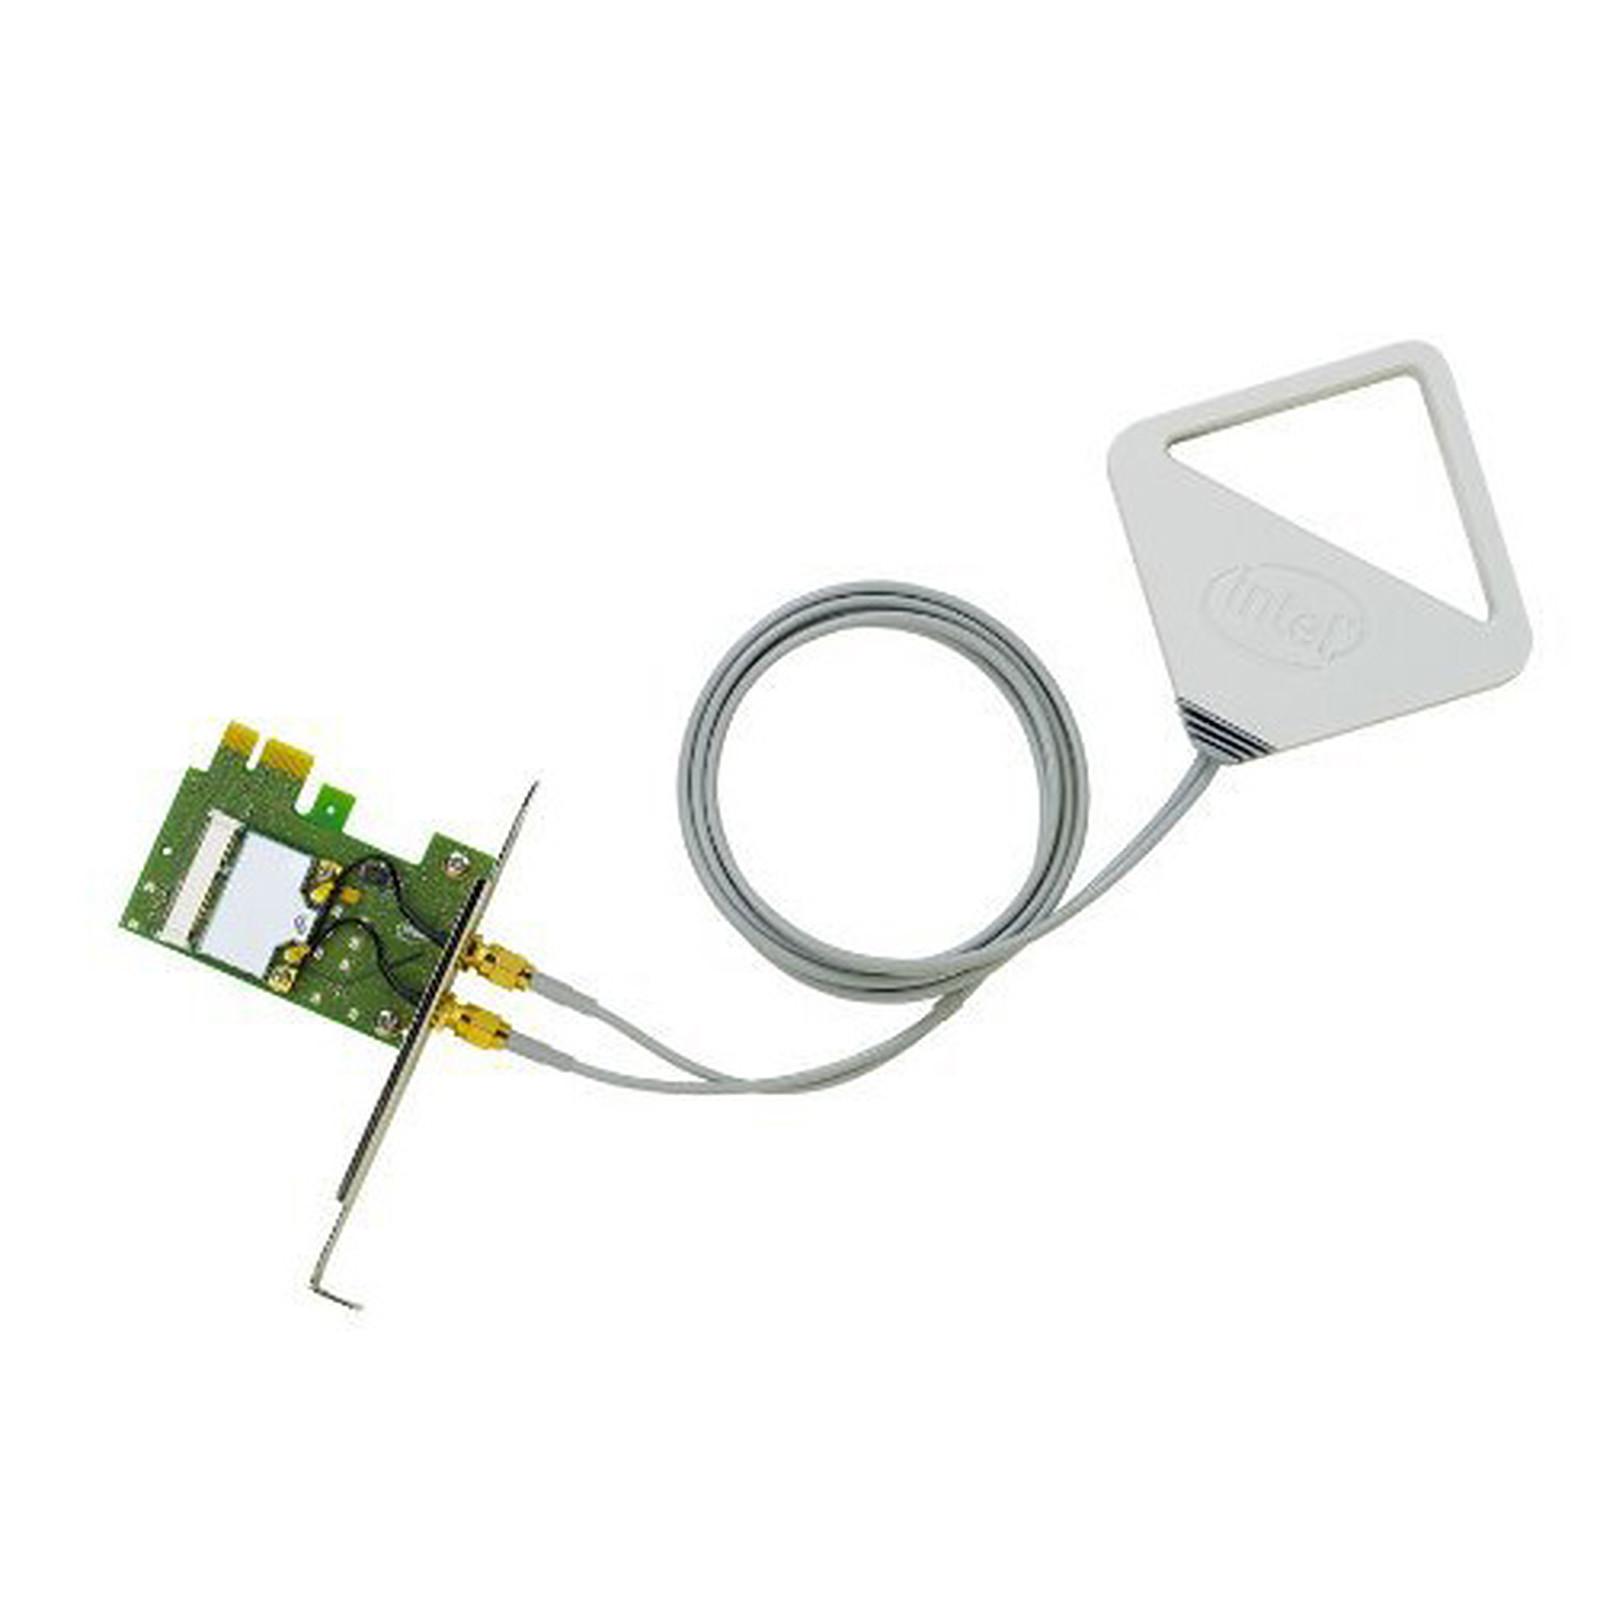 Intel Centrino Dual Band Wireless-AC 7260 + Bluetooth Adapter